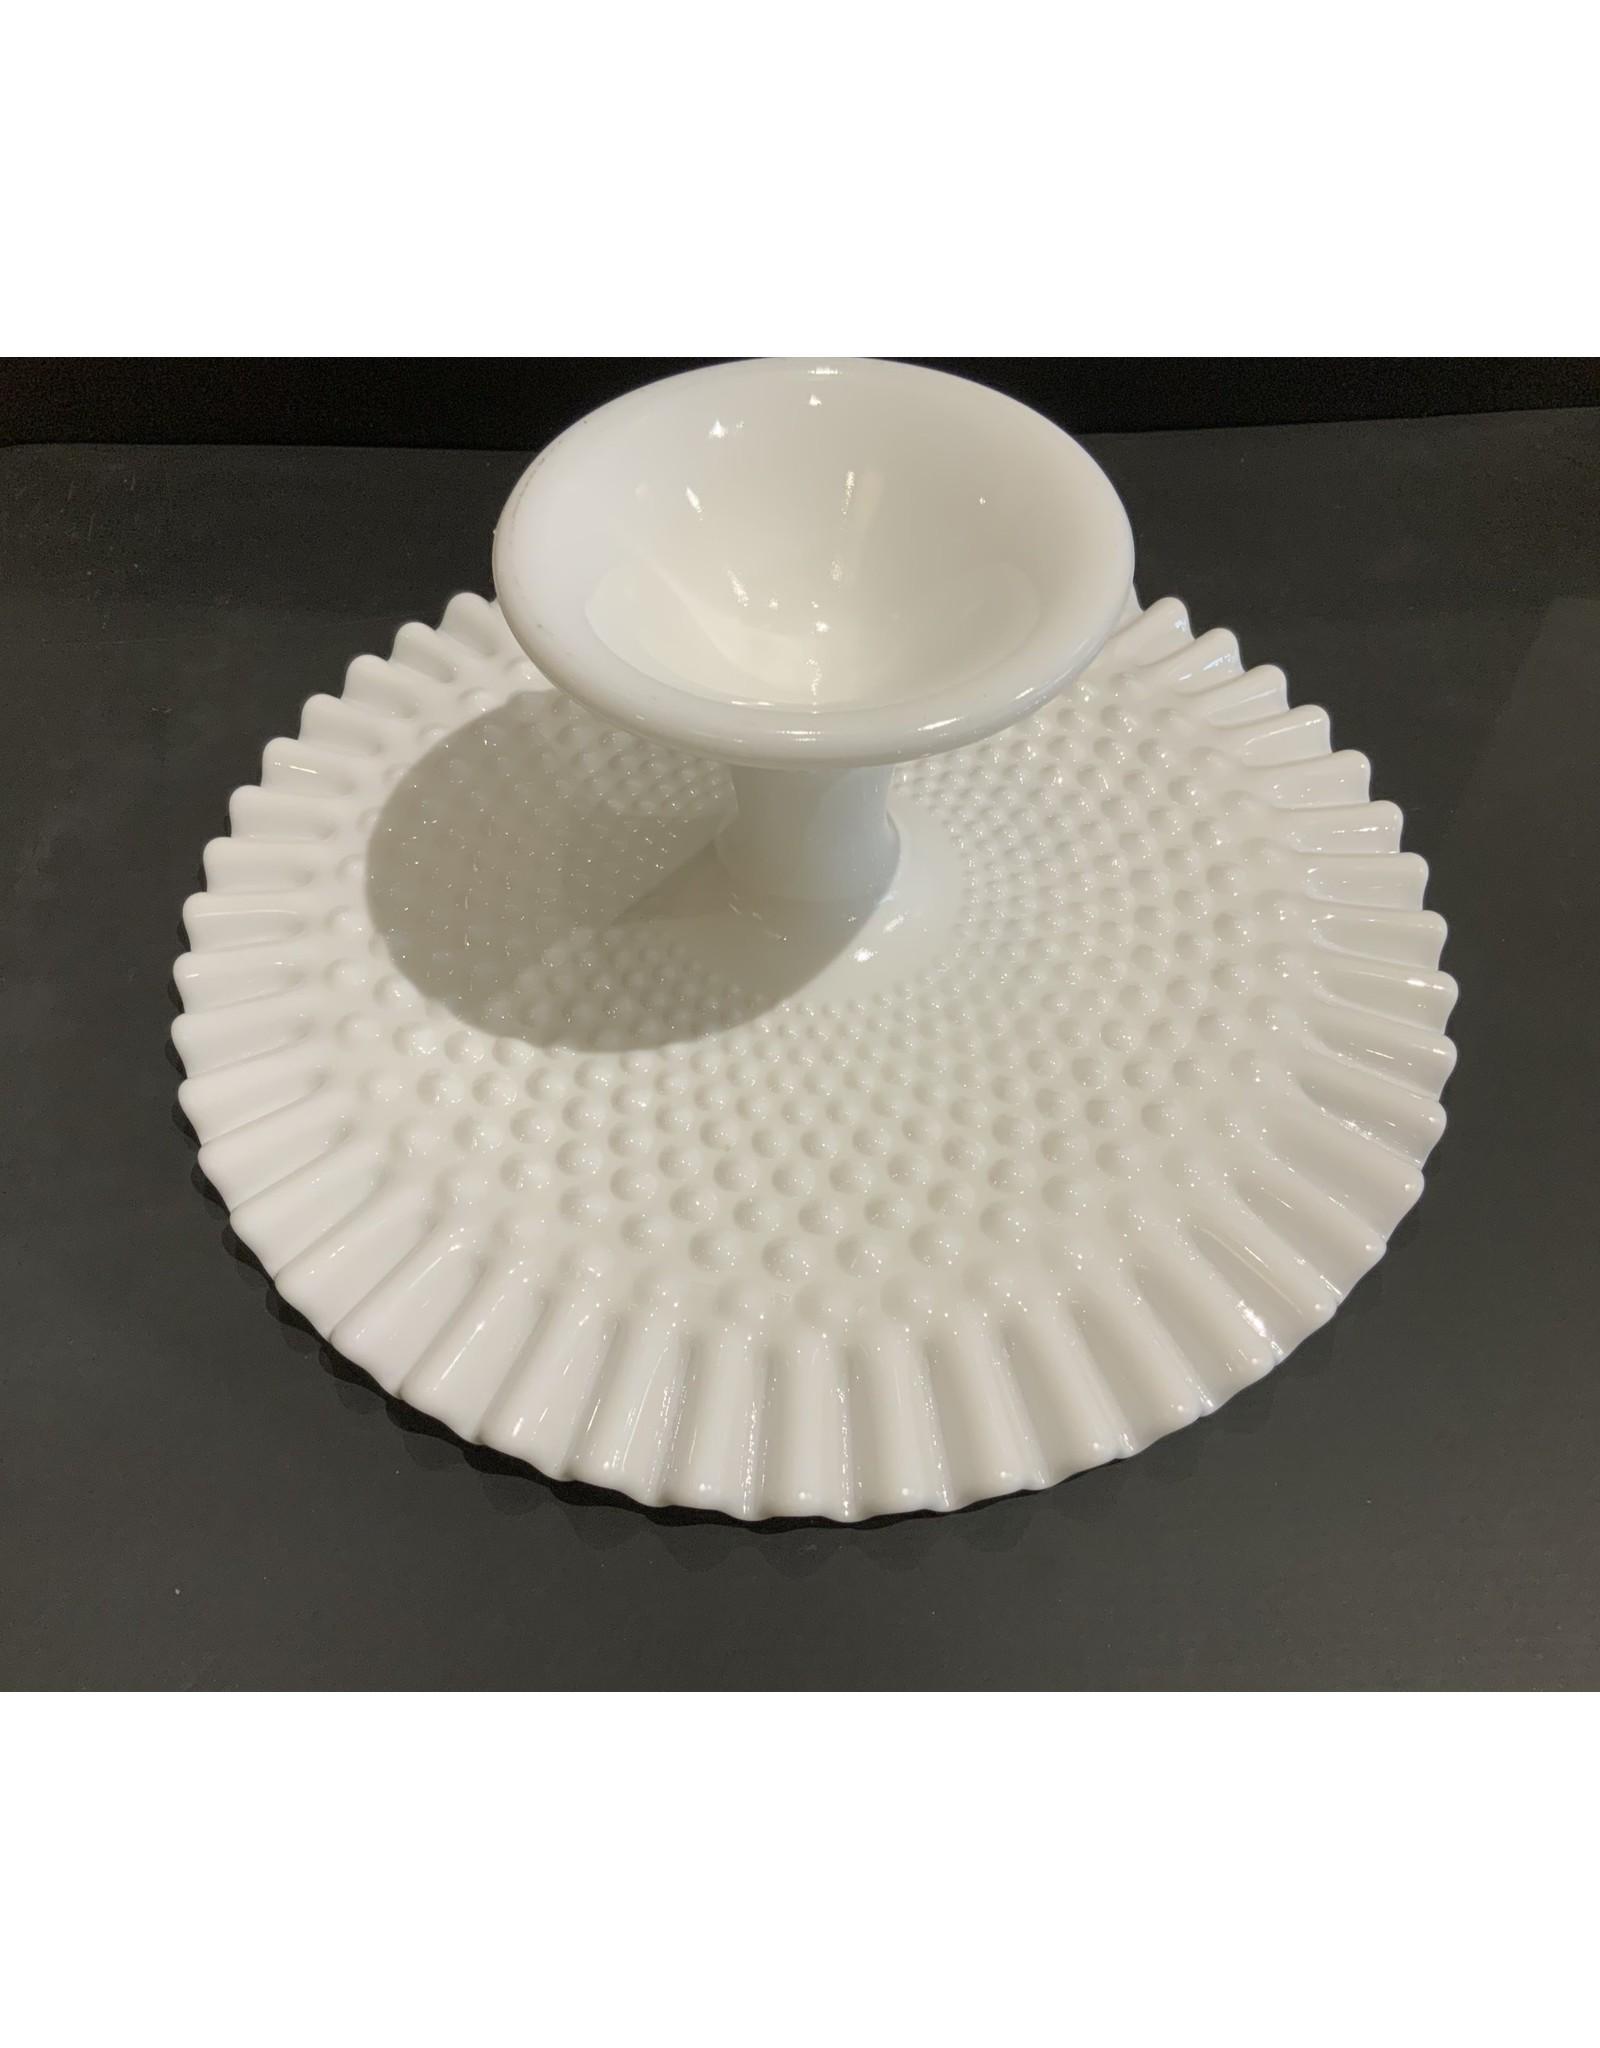 SPV Fenton Hobnail milk glass pedestal cake stand